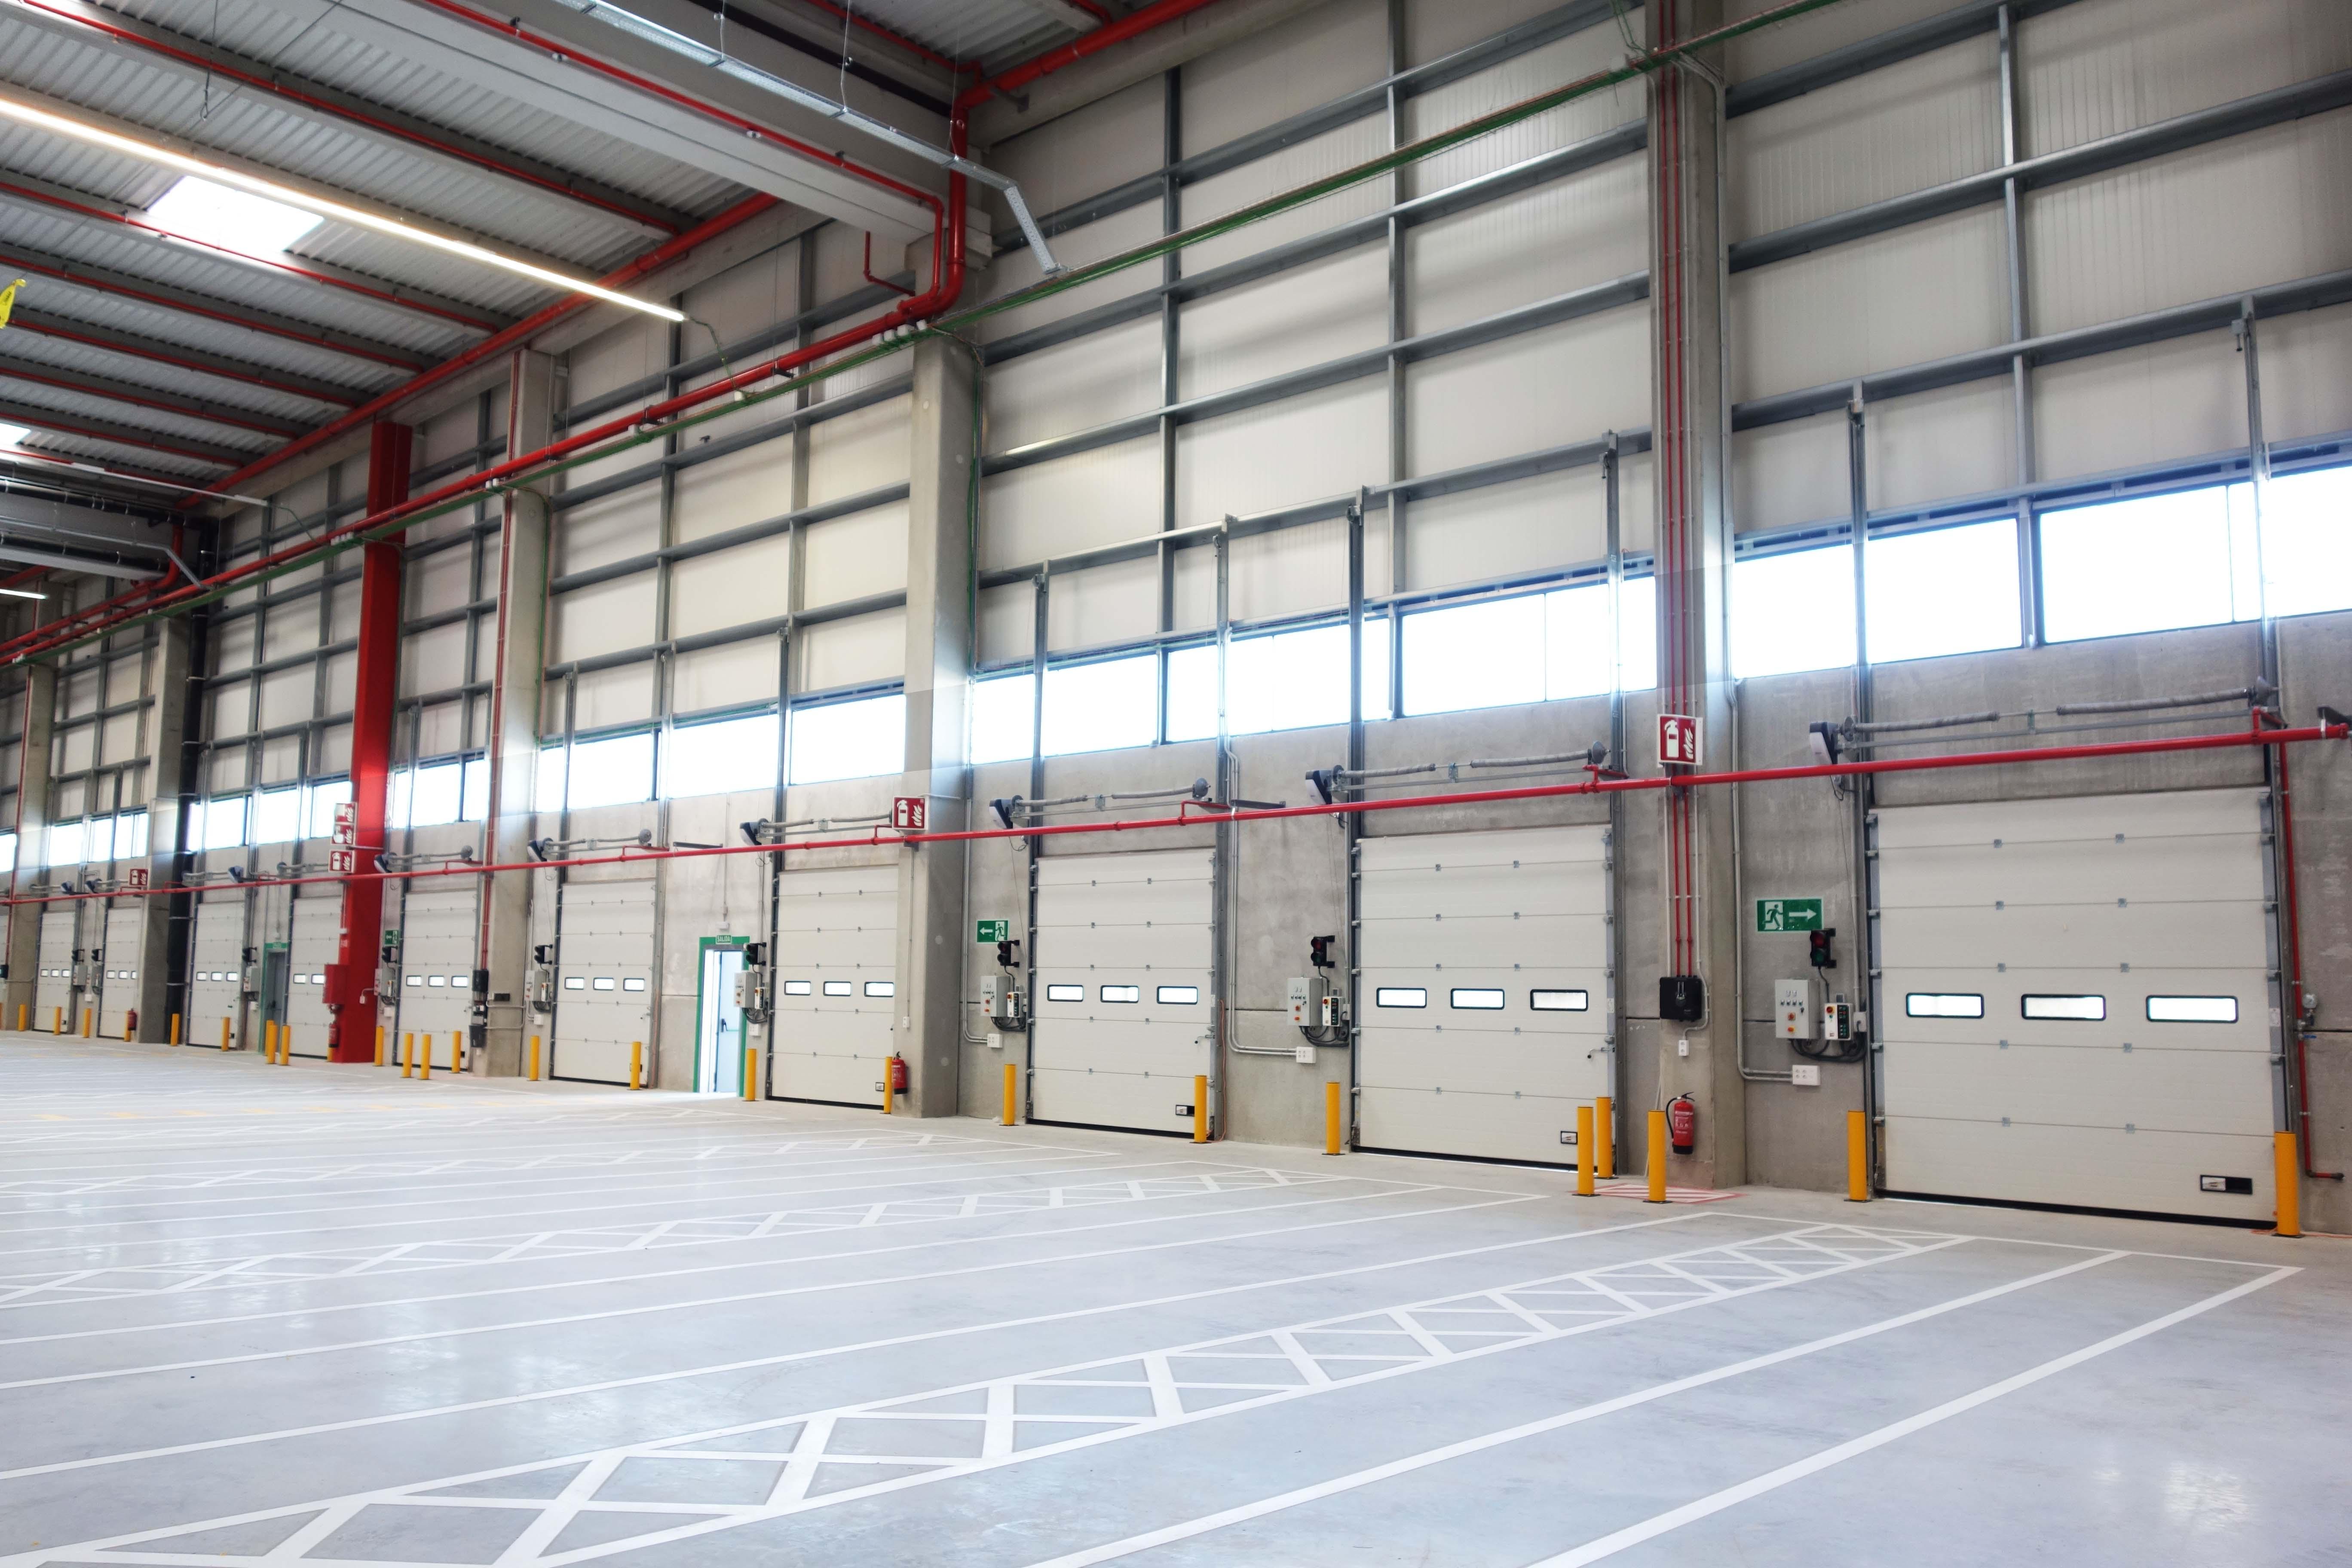 INKEMA Sectional Doors and Dock Levellers